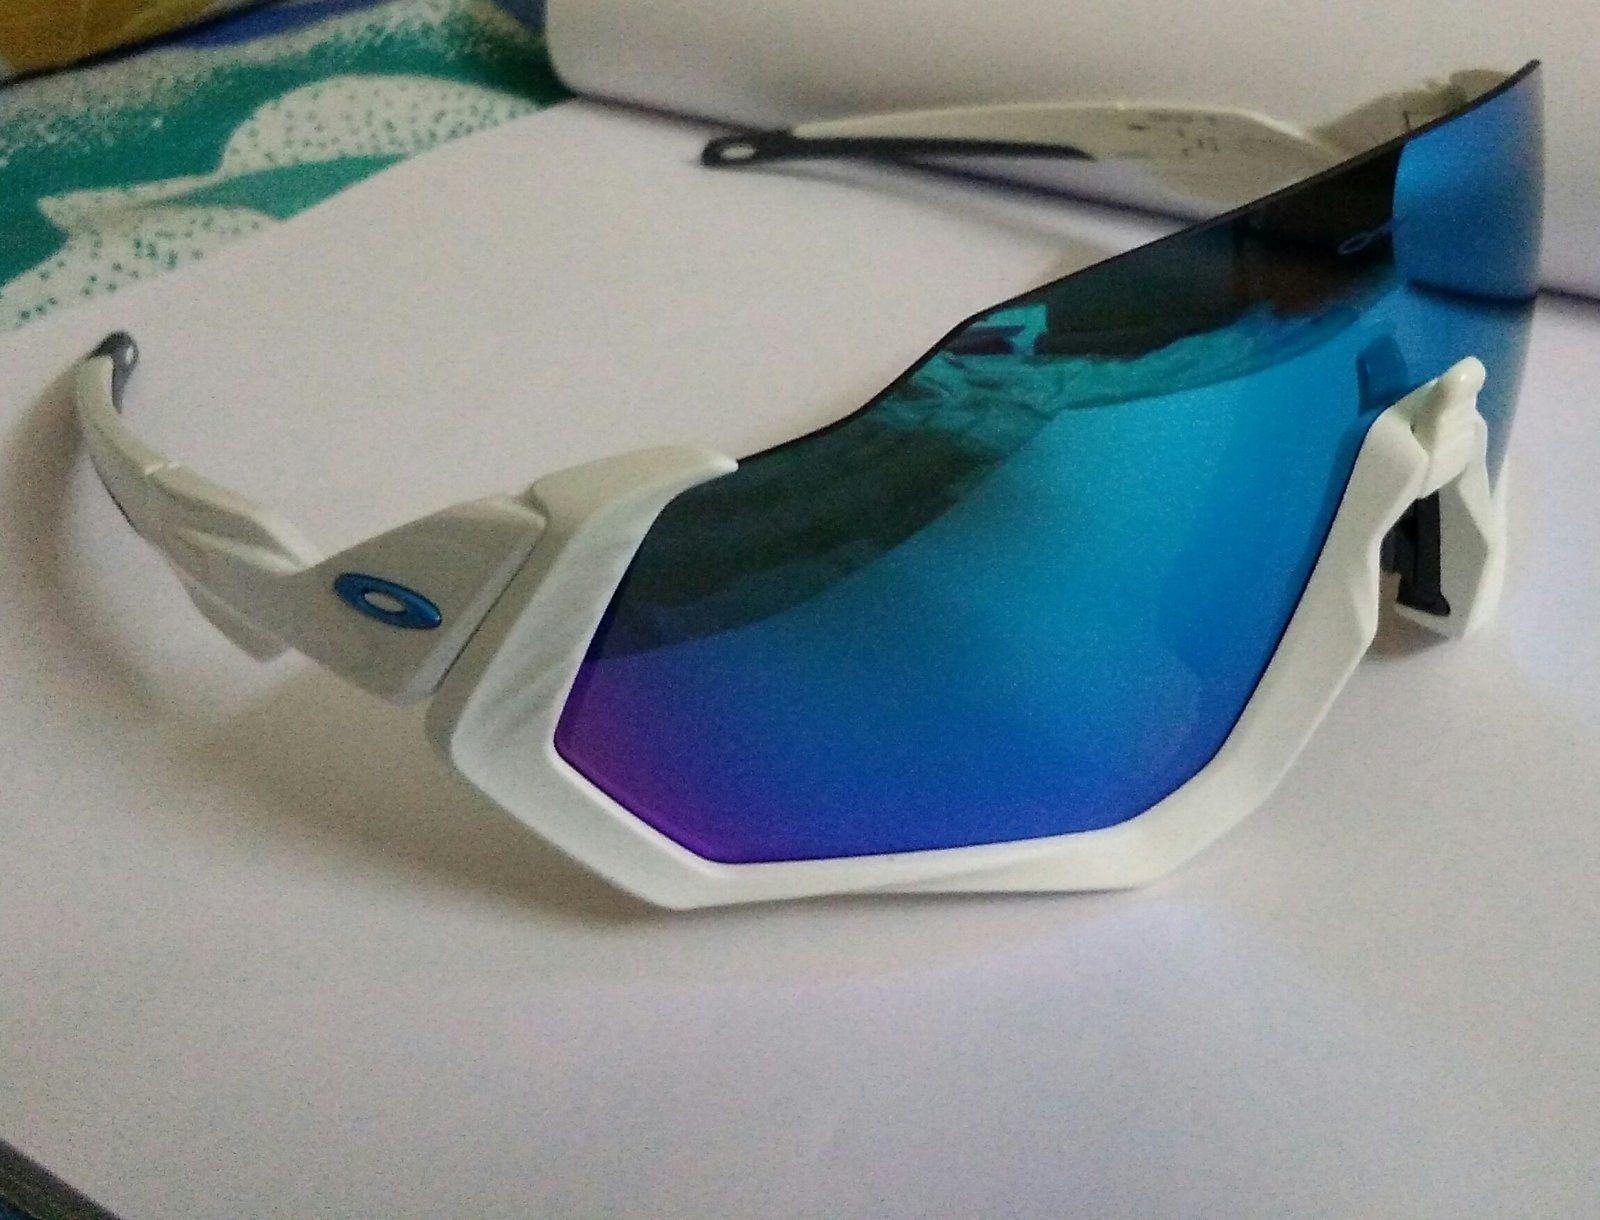 d8210808a81 Oakley Flight Jacket Matte White Prizm Sapphire - IMG 20180805 103127.jpg